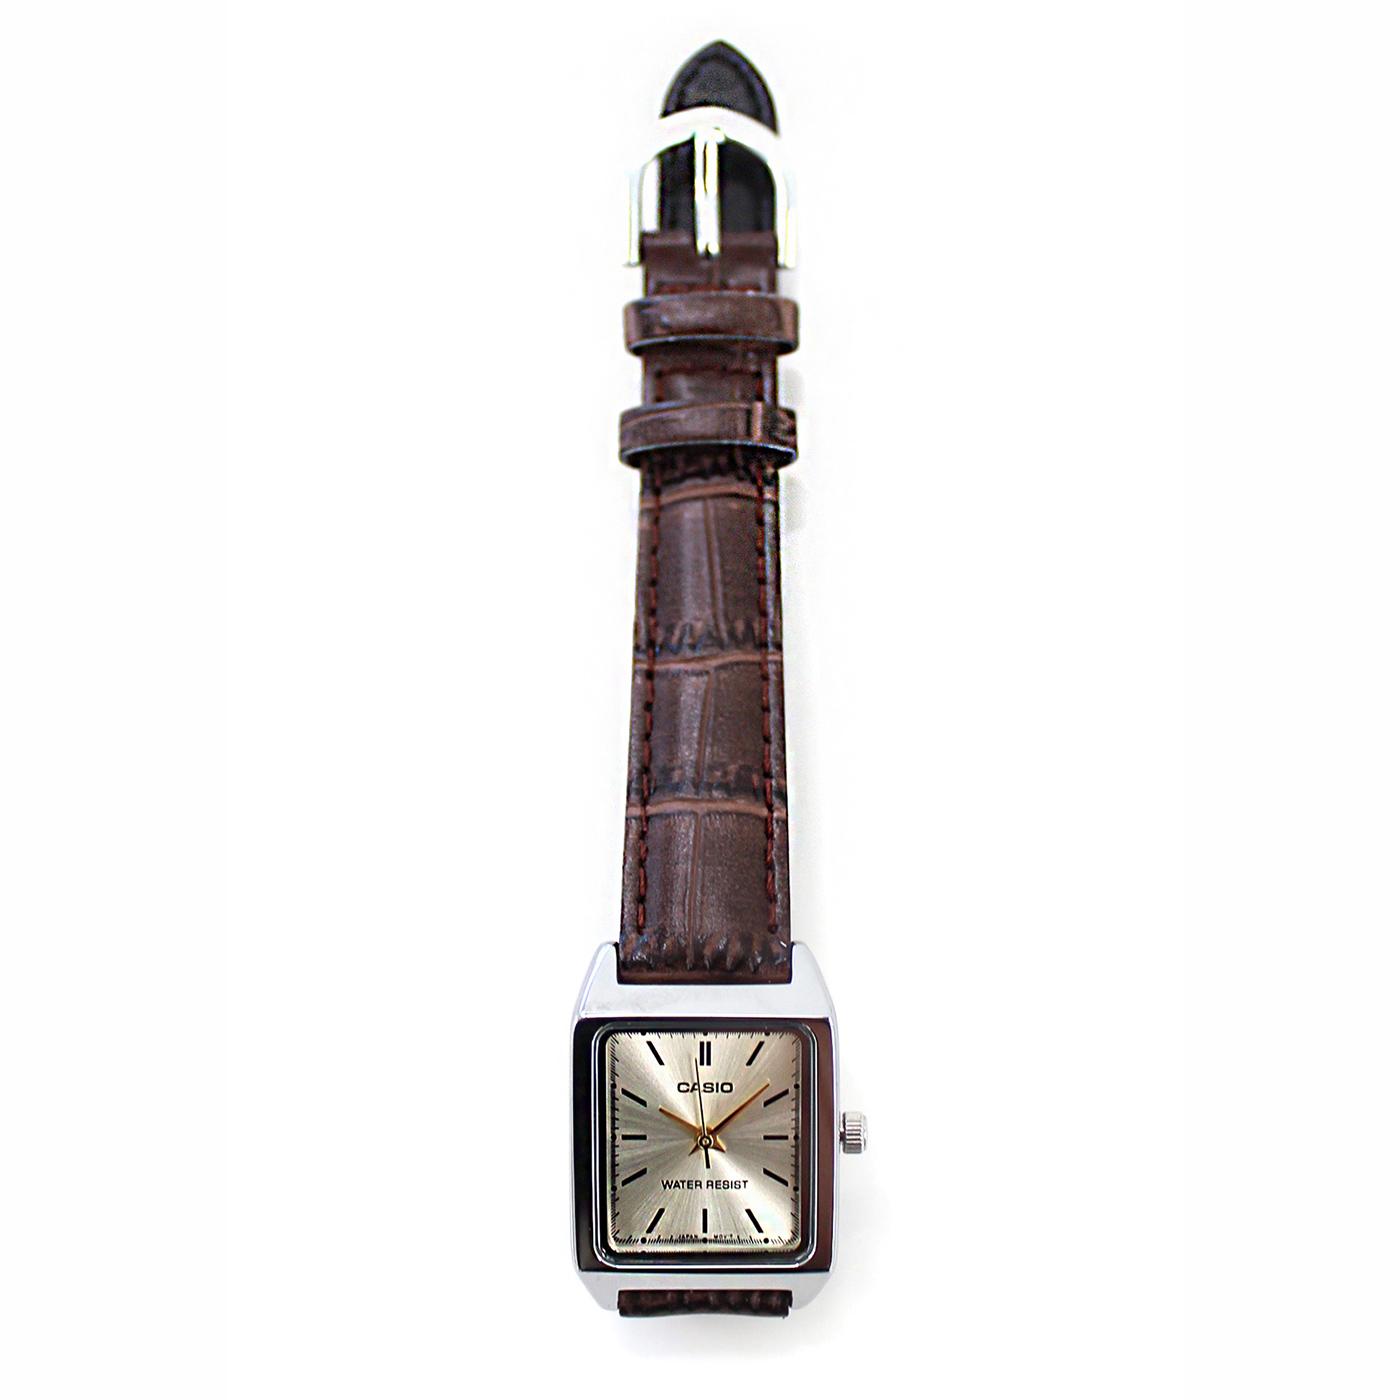 IEDIT[イディット] SELECT CASIO 腕時計レザー スクエアLTP-V007L-9E〈ブラウン〉